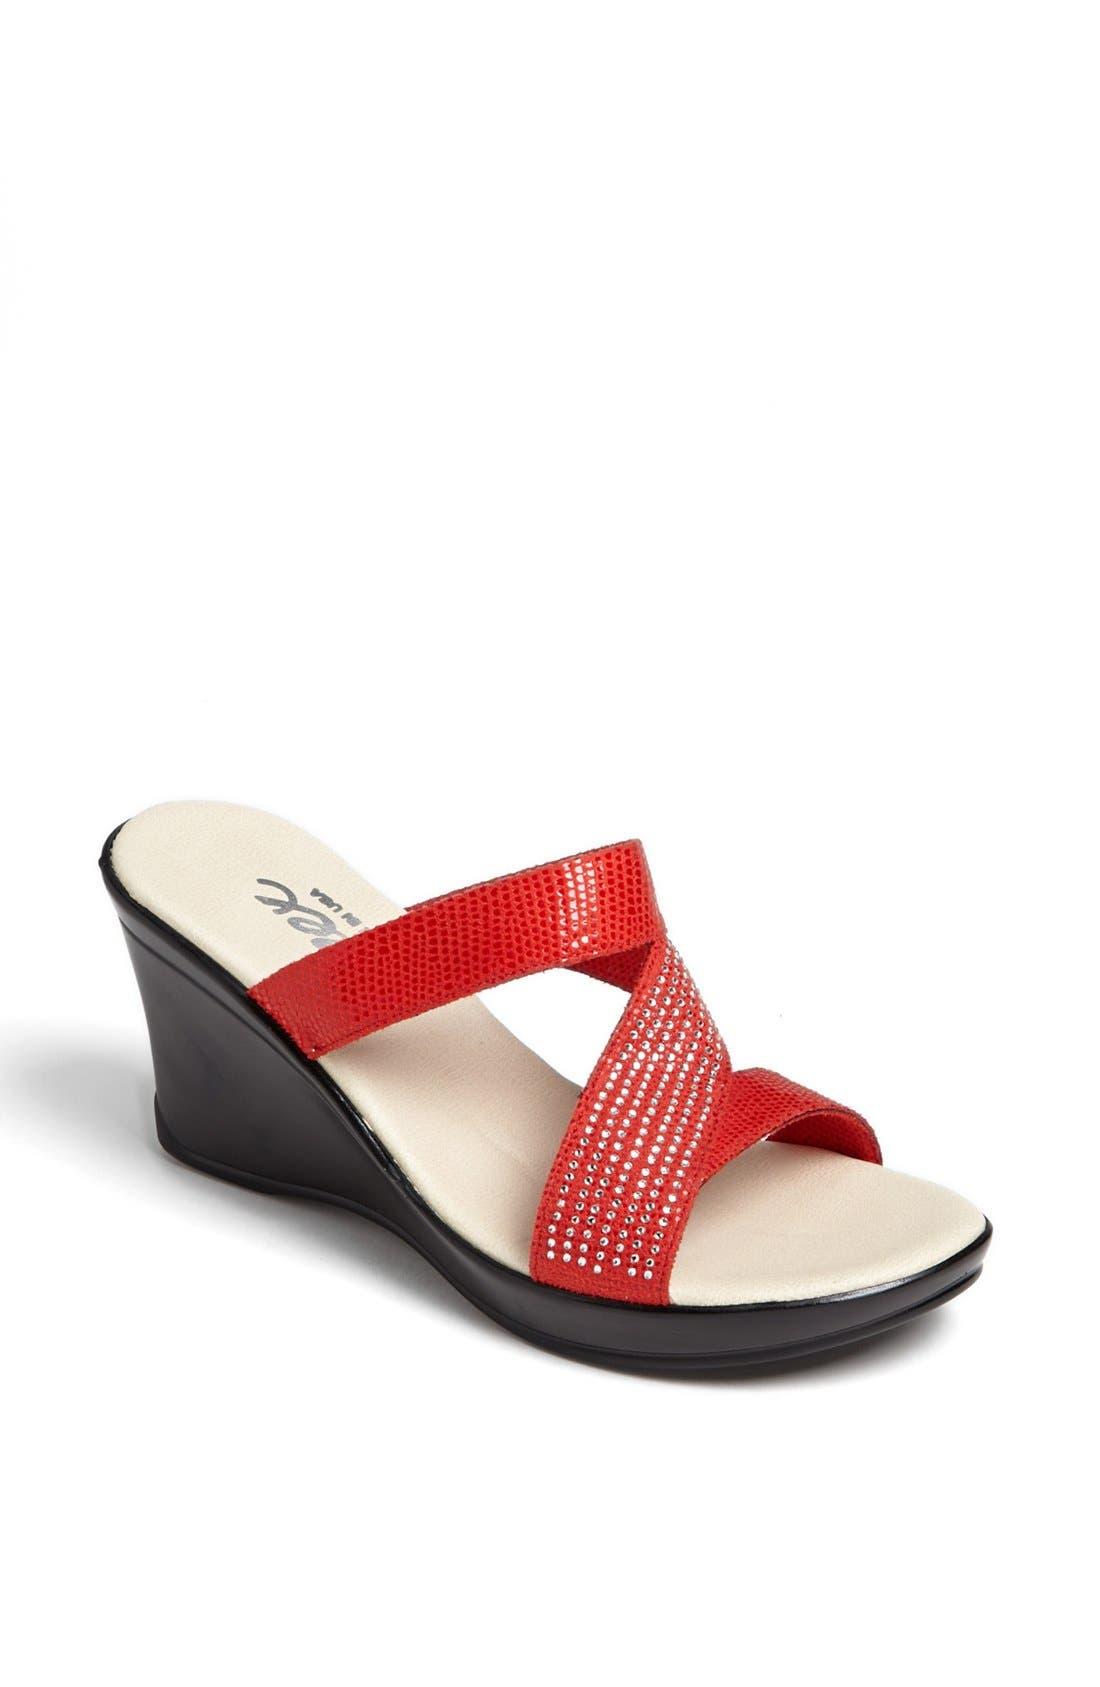 Alternate Image 1 Selected - Onex 'Savannah' Sandal